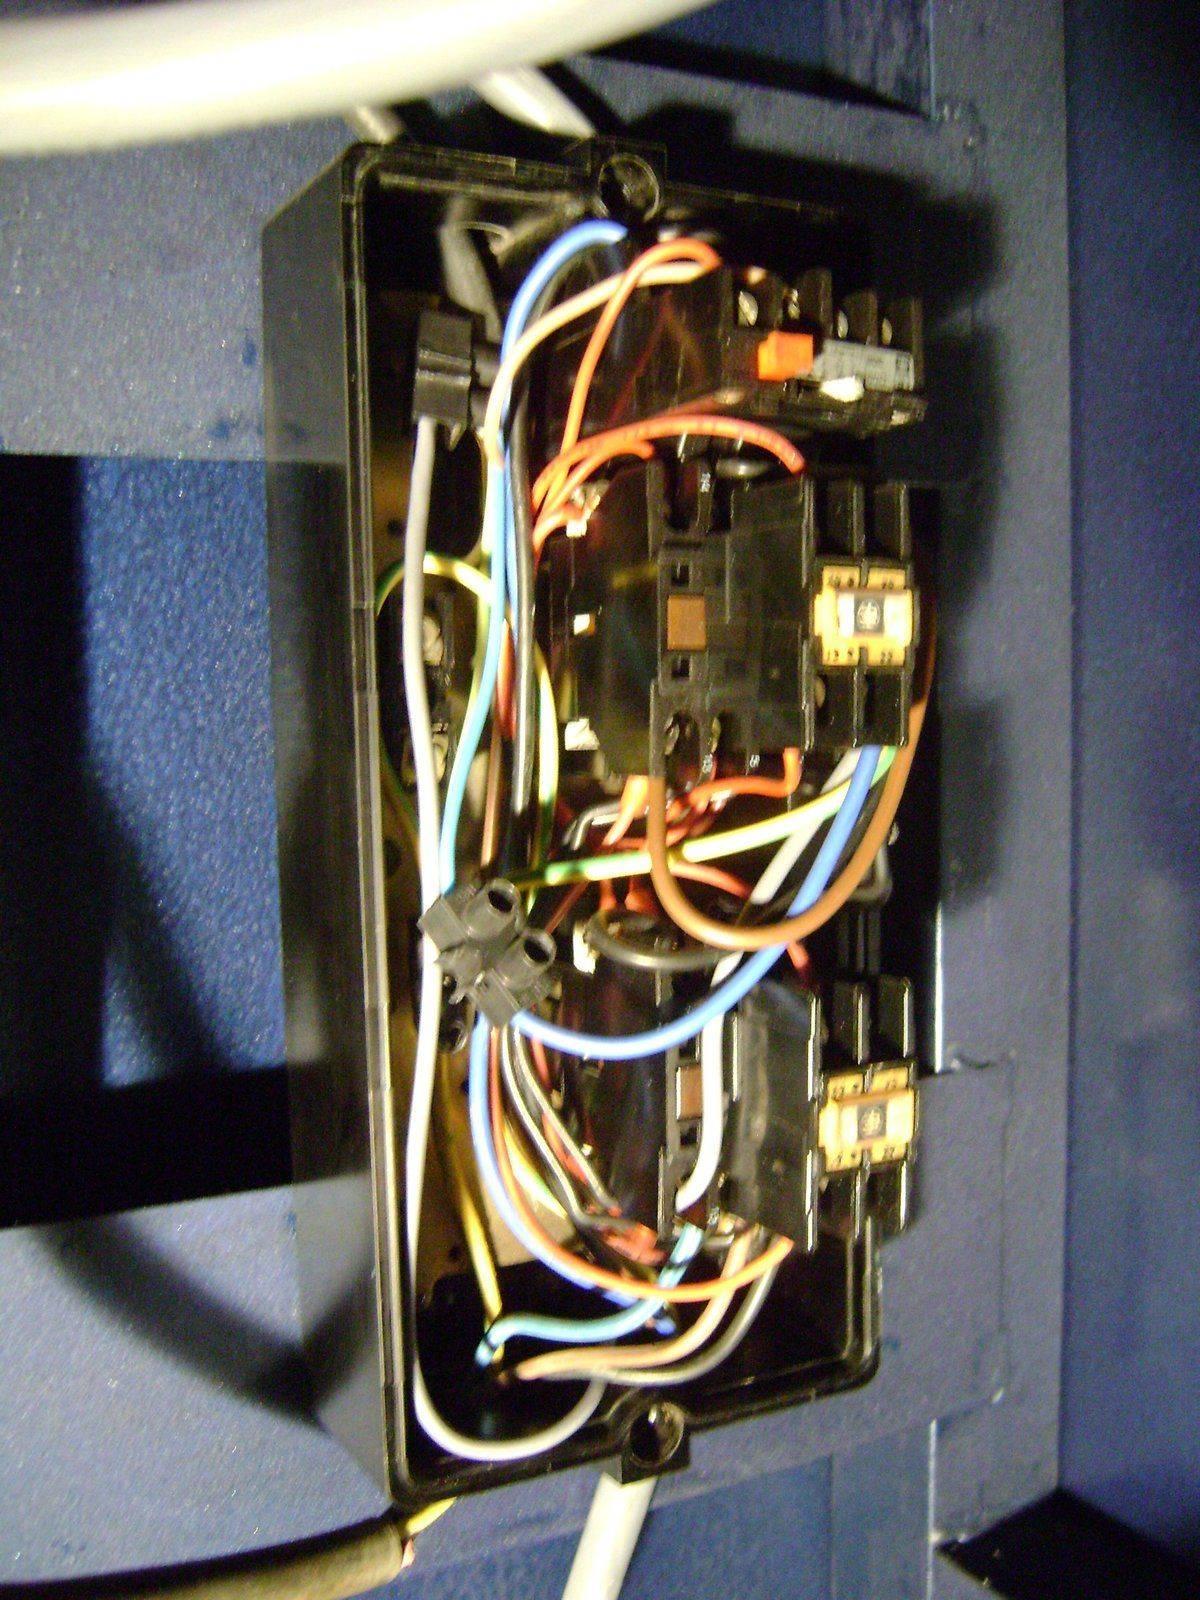 DSC00434.JPG